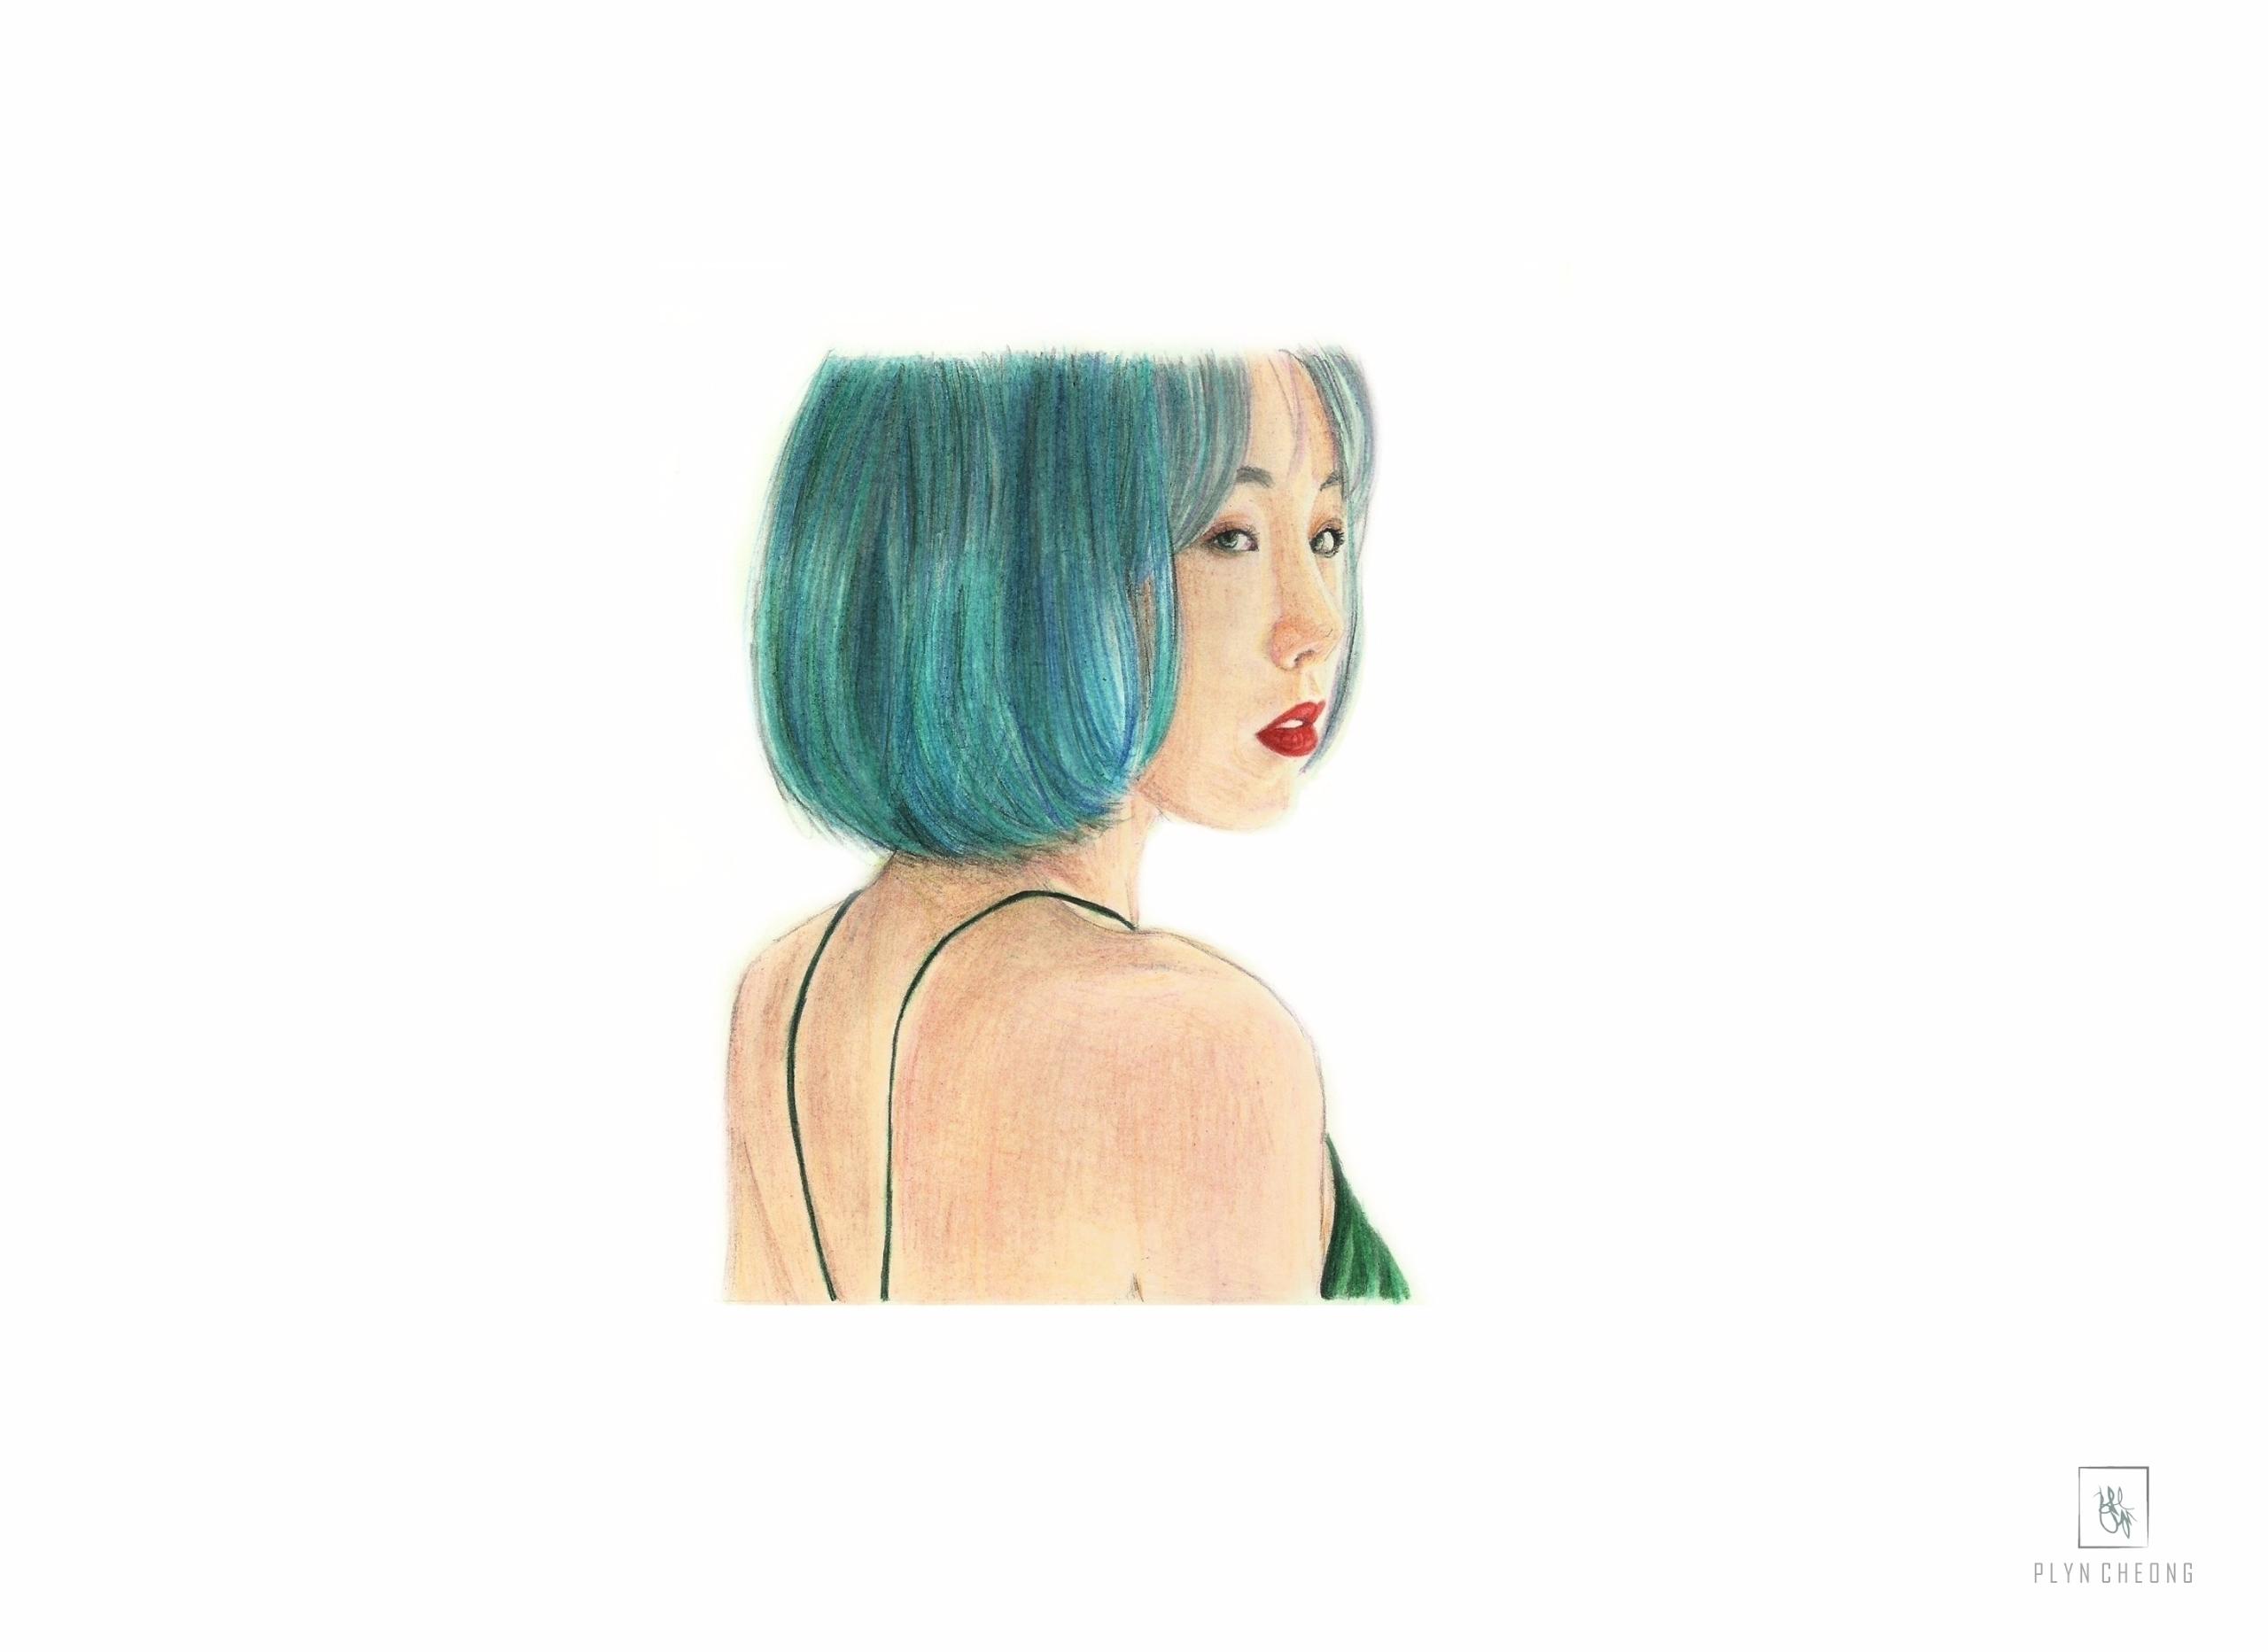 Taeyeon, snsd, practice, portrait - plyncheong | ello